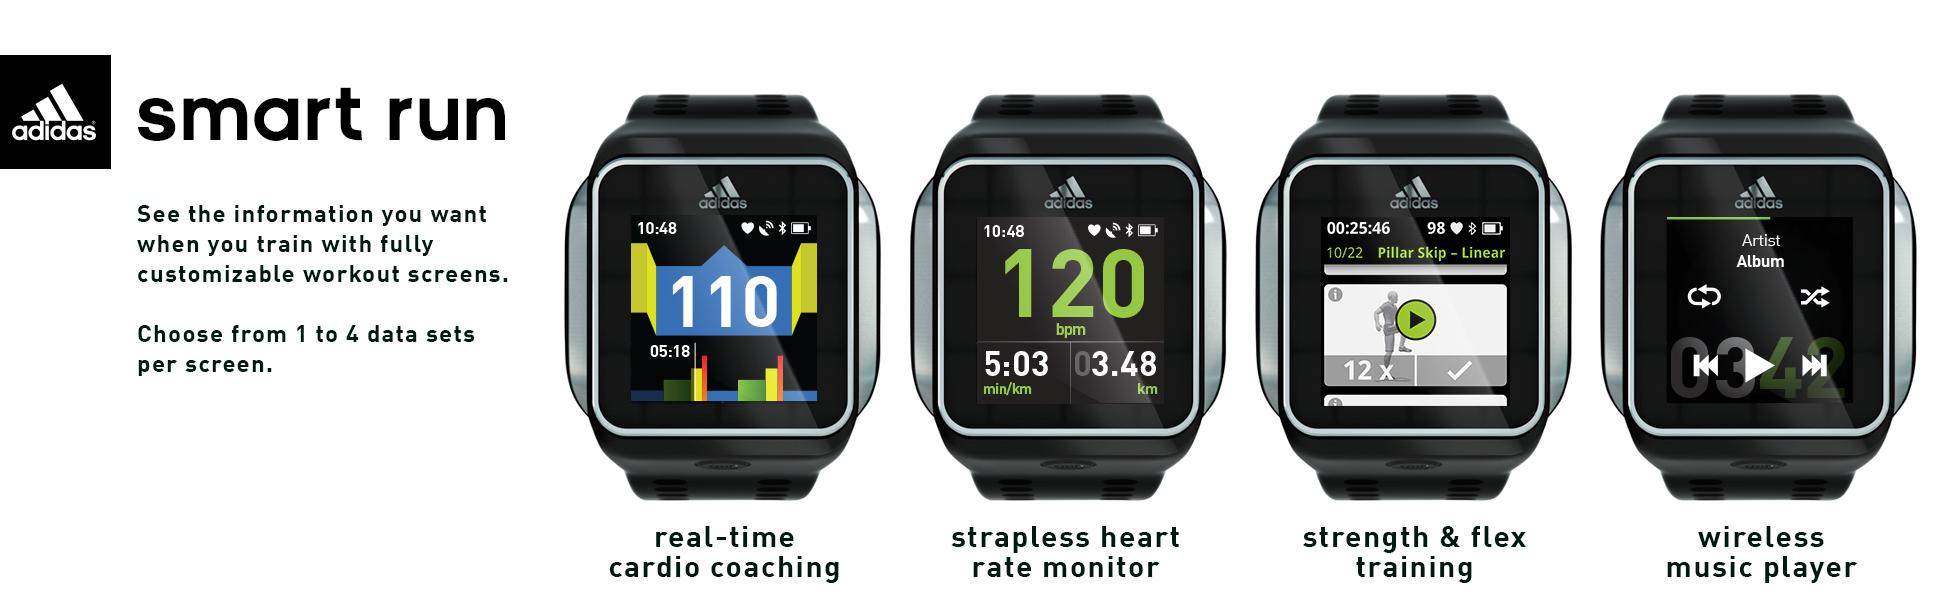 4be01594f60 relógio adidas micoach smart run - Couleurs Bijoux